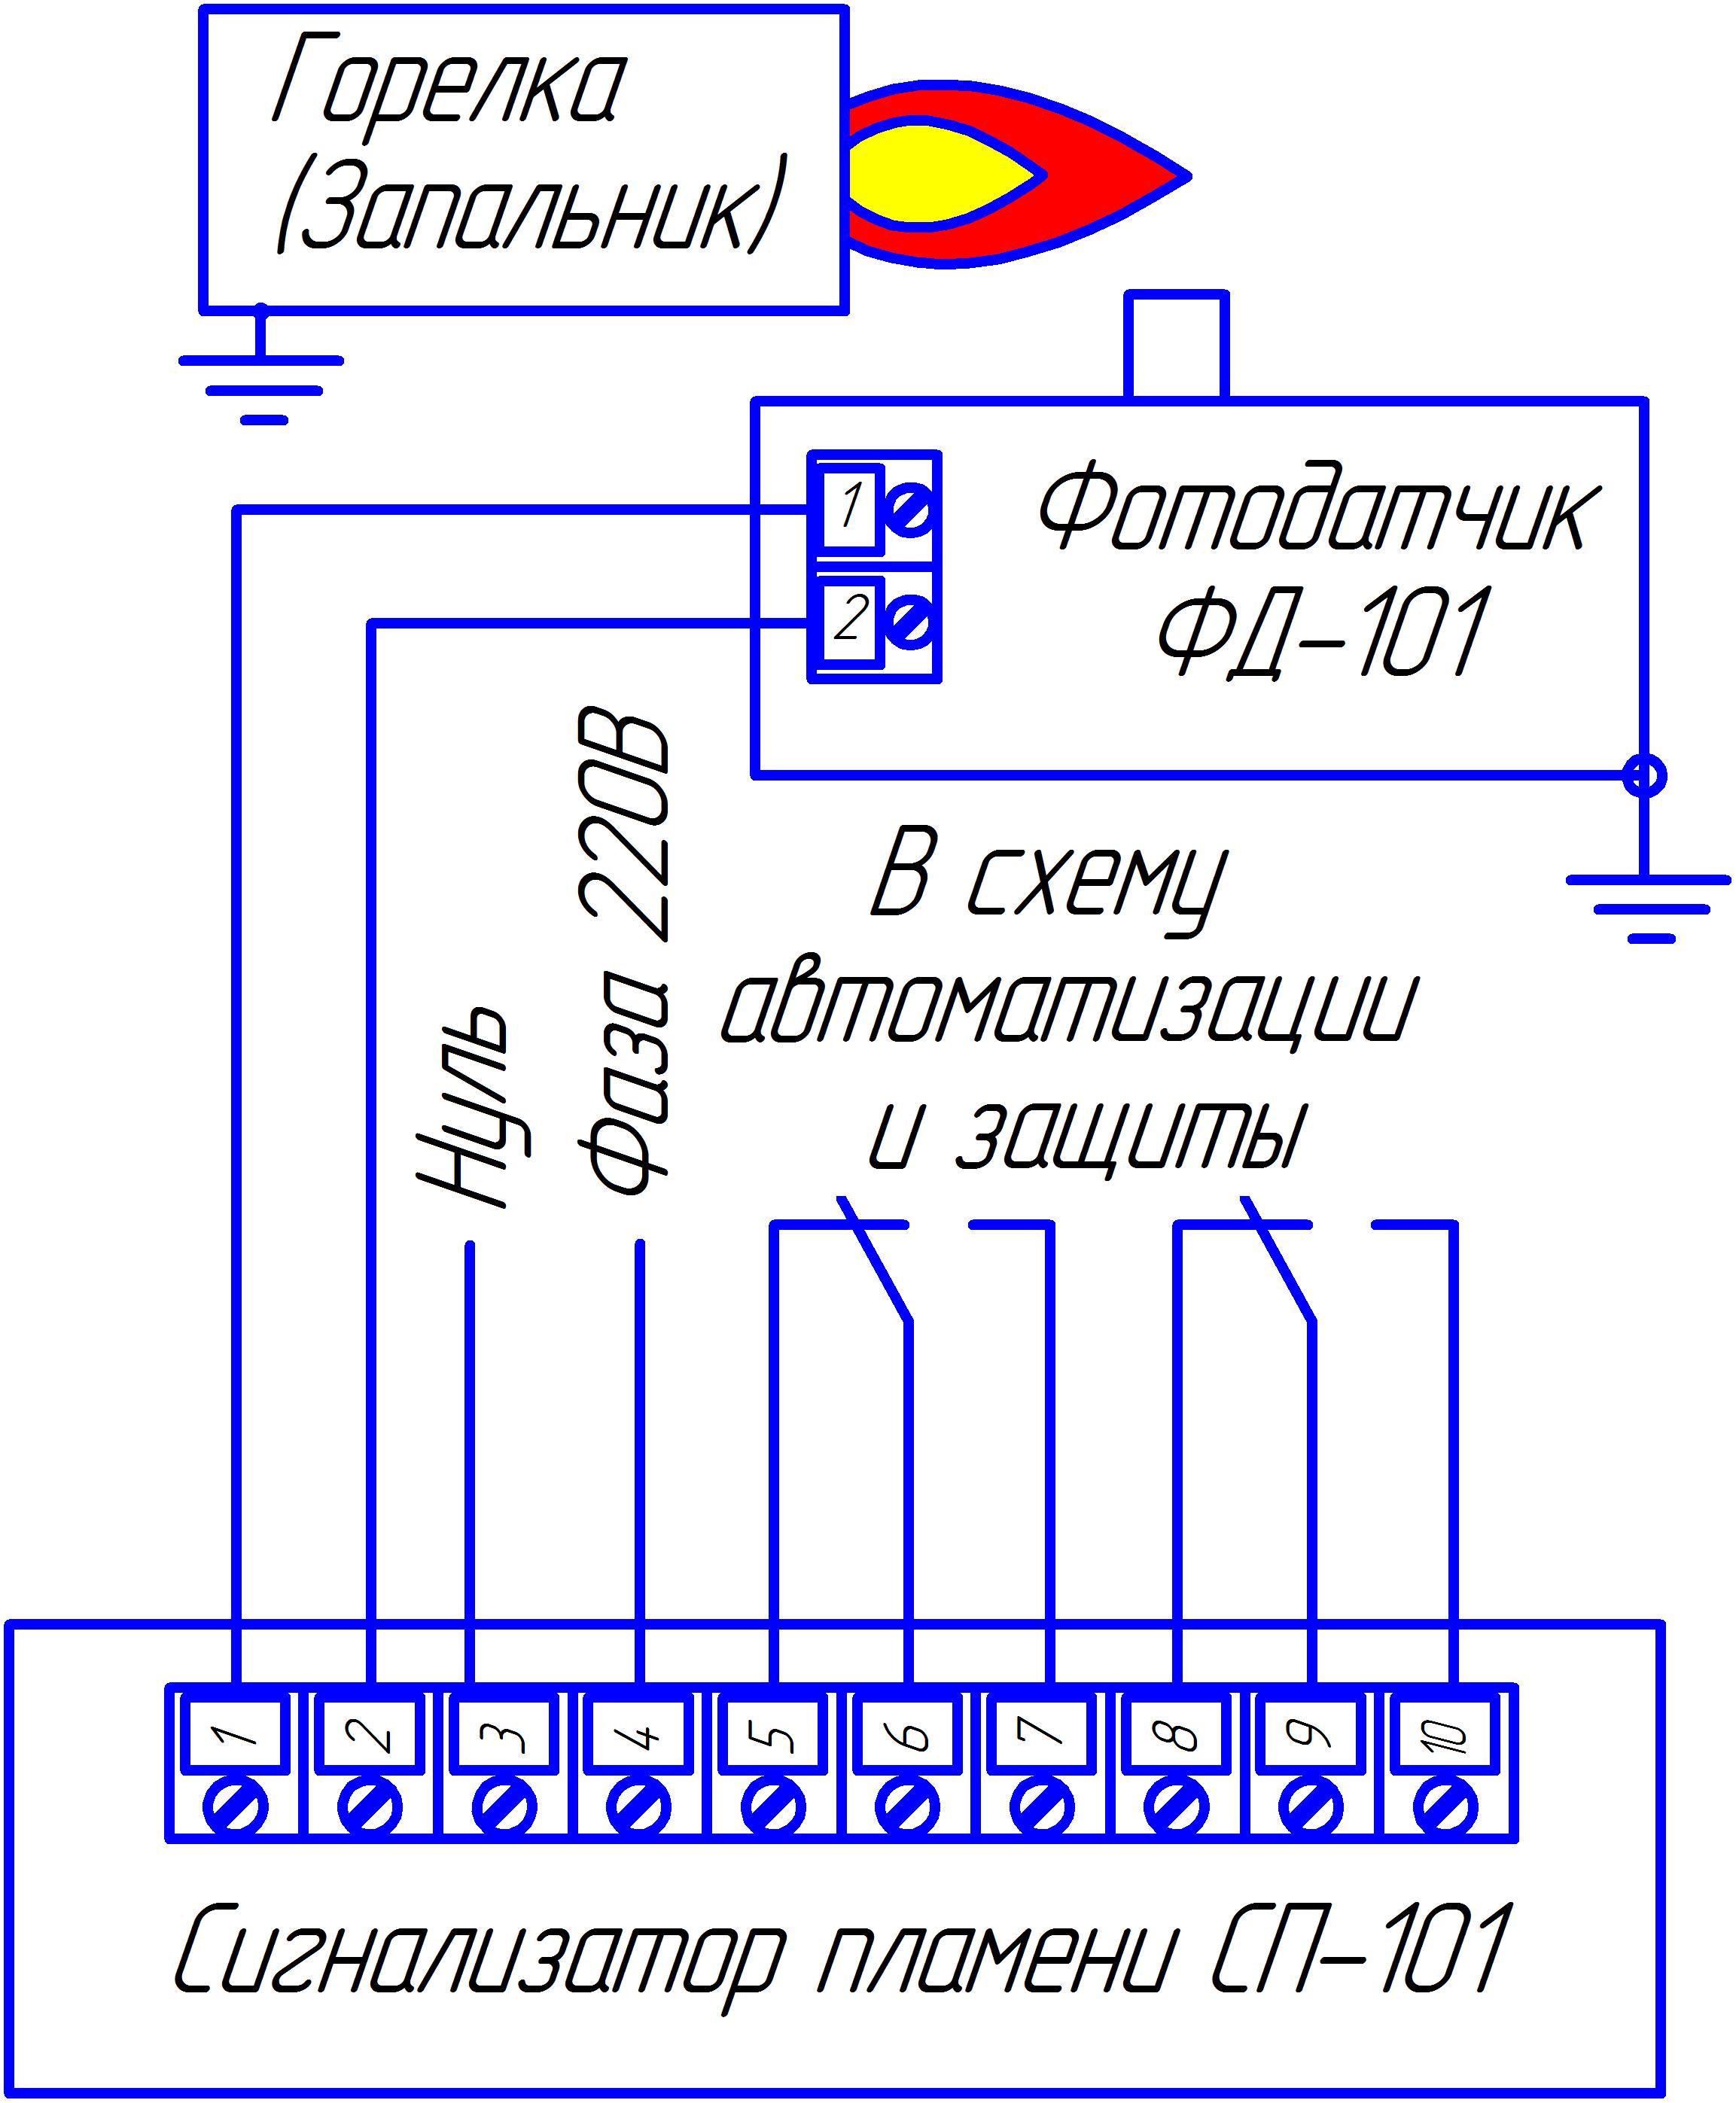 Схема пламени горелки